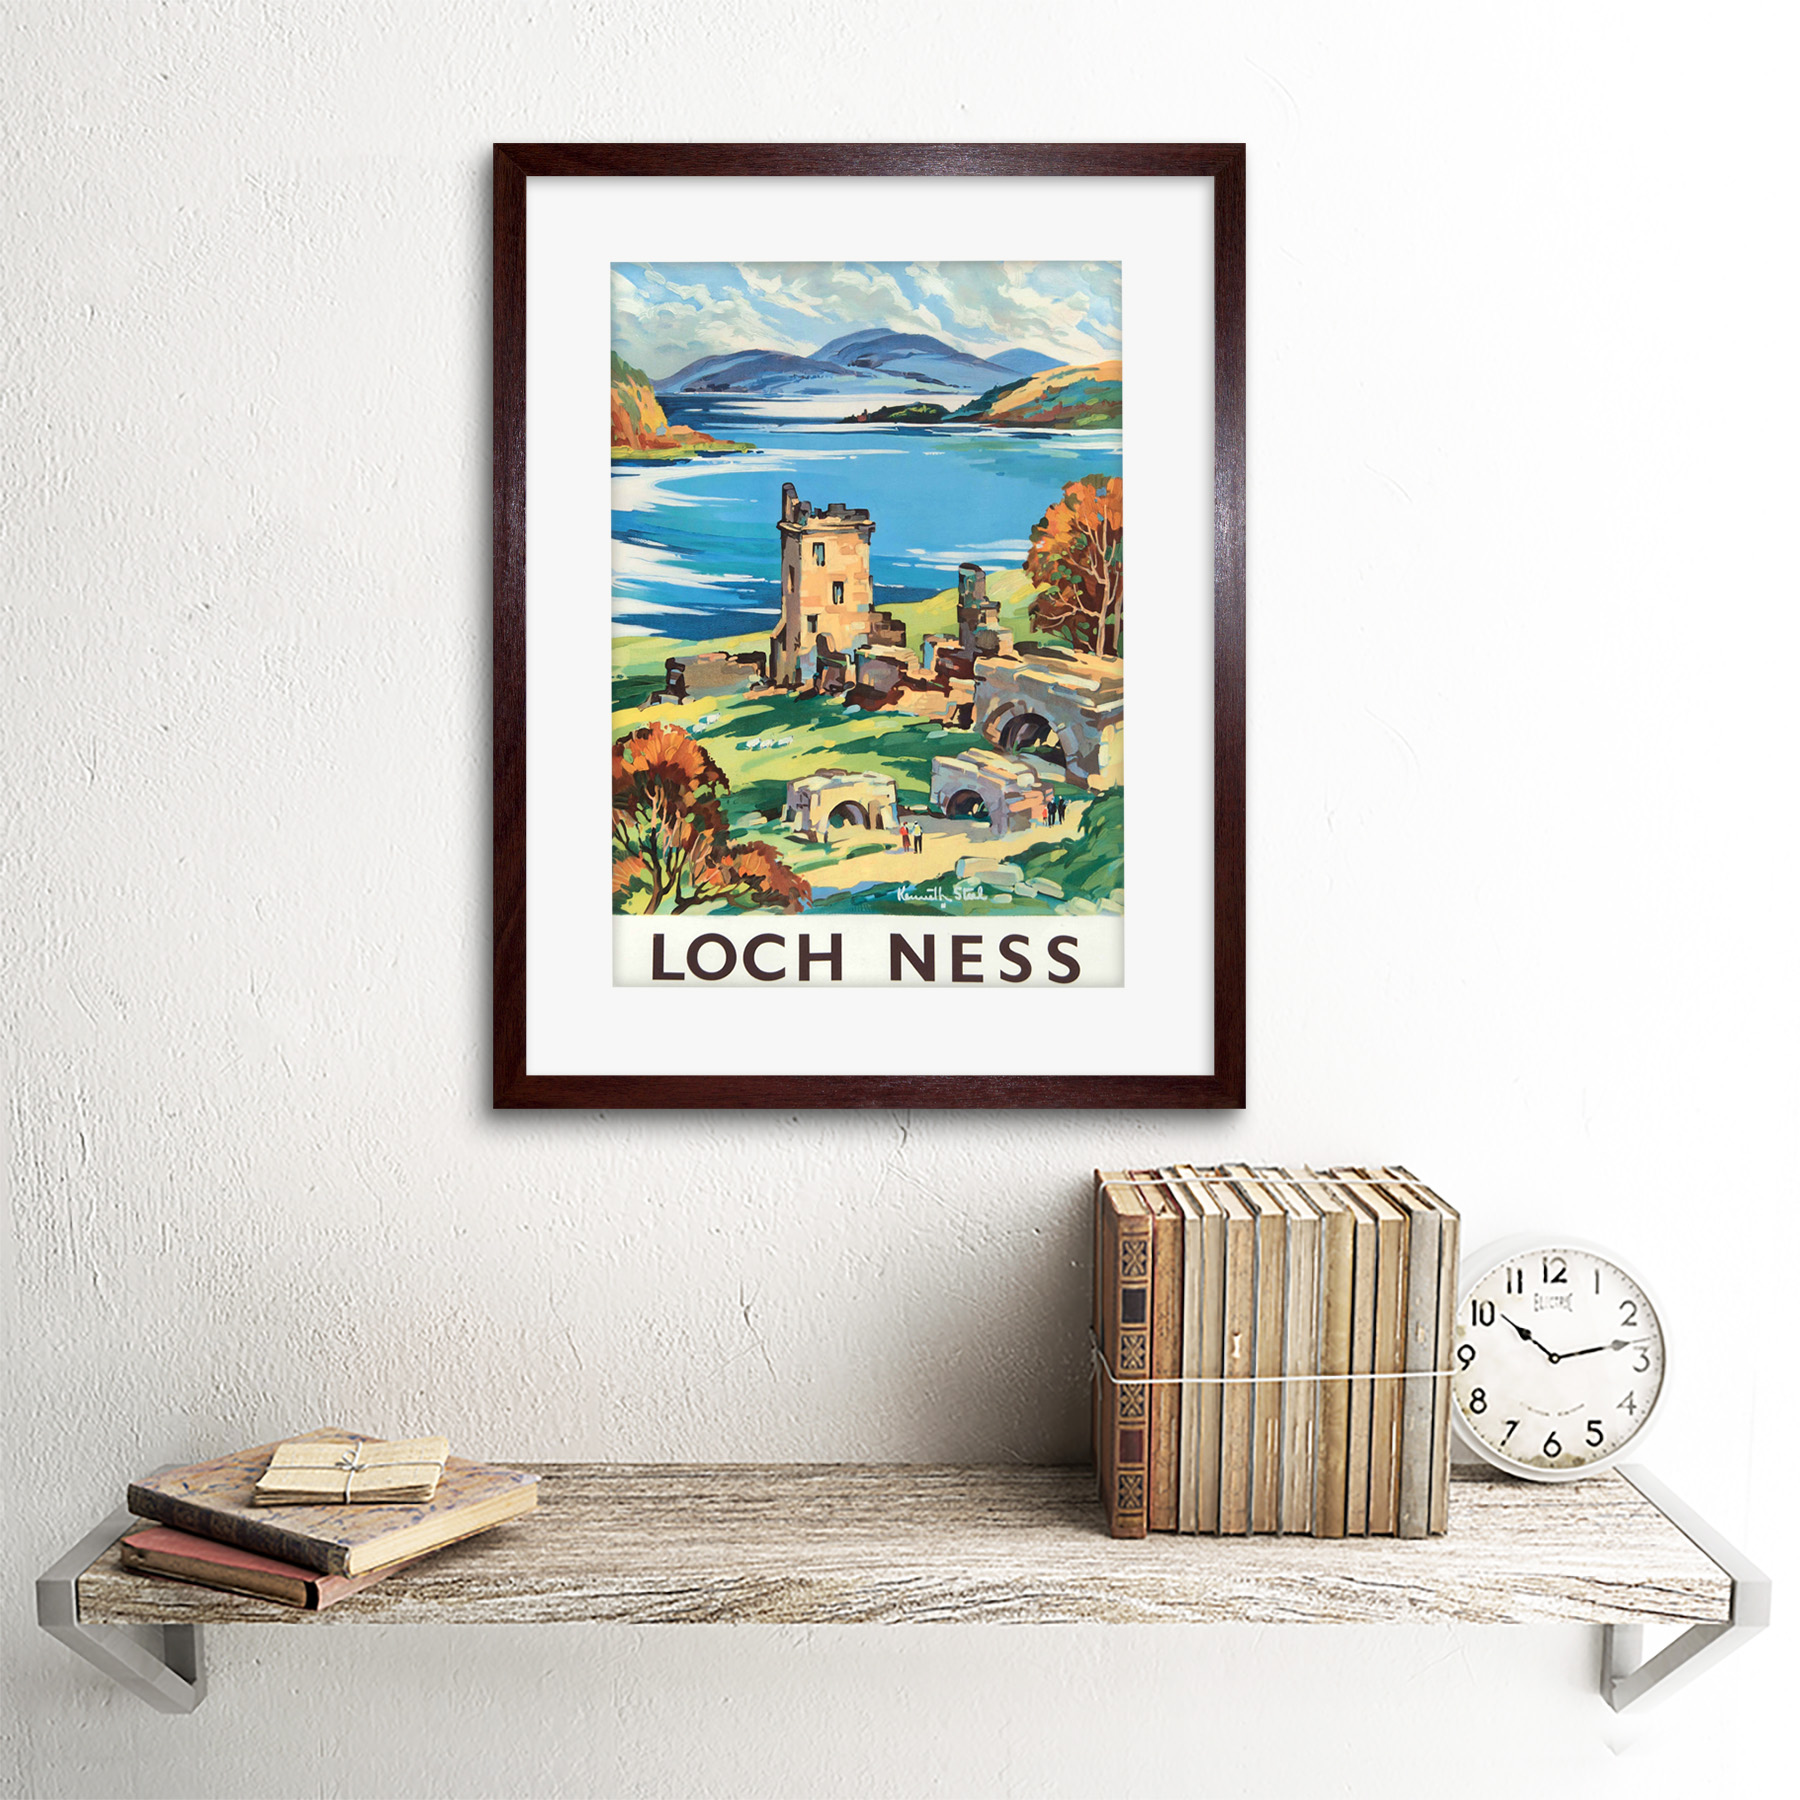 thumbnail 8 - Travel-Scotland-Castle-Loch-Ness-British-Railways-Framed-Art-Print-12x16-Inch